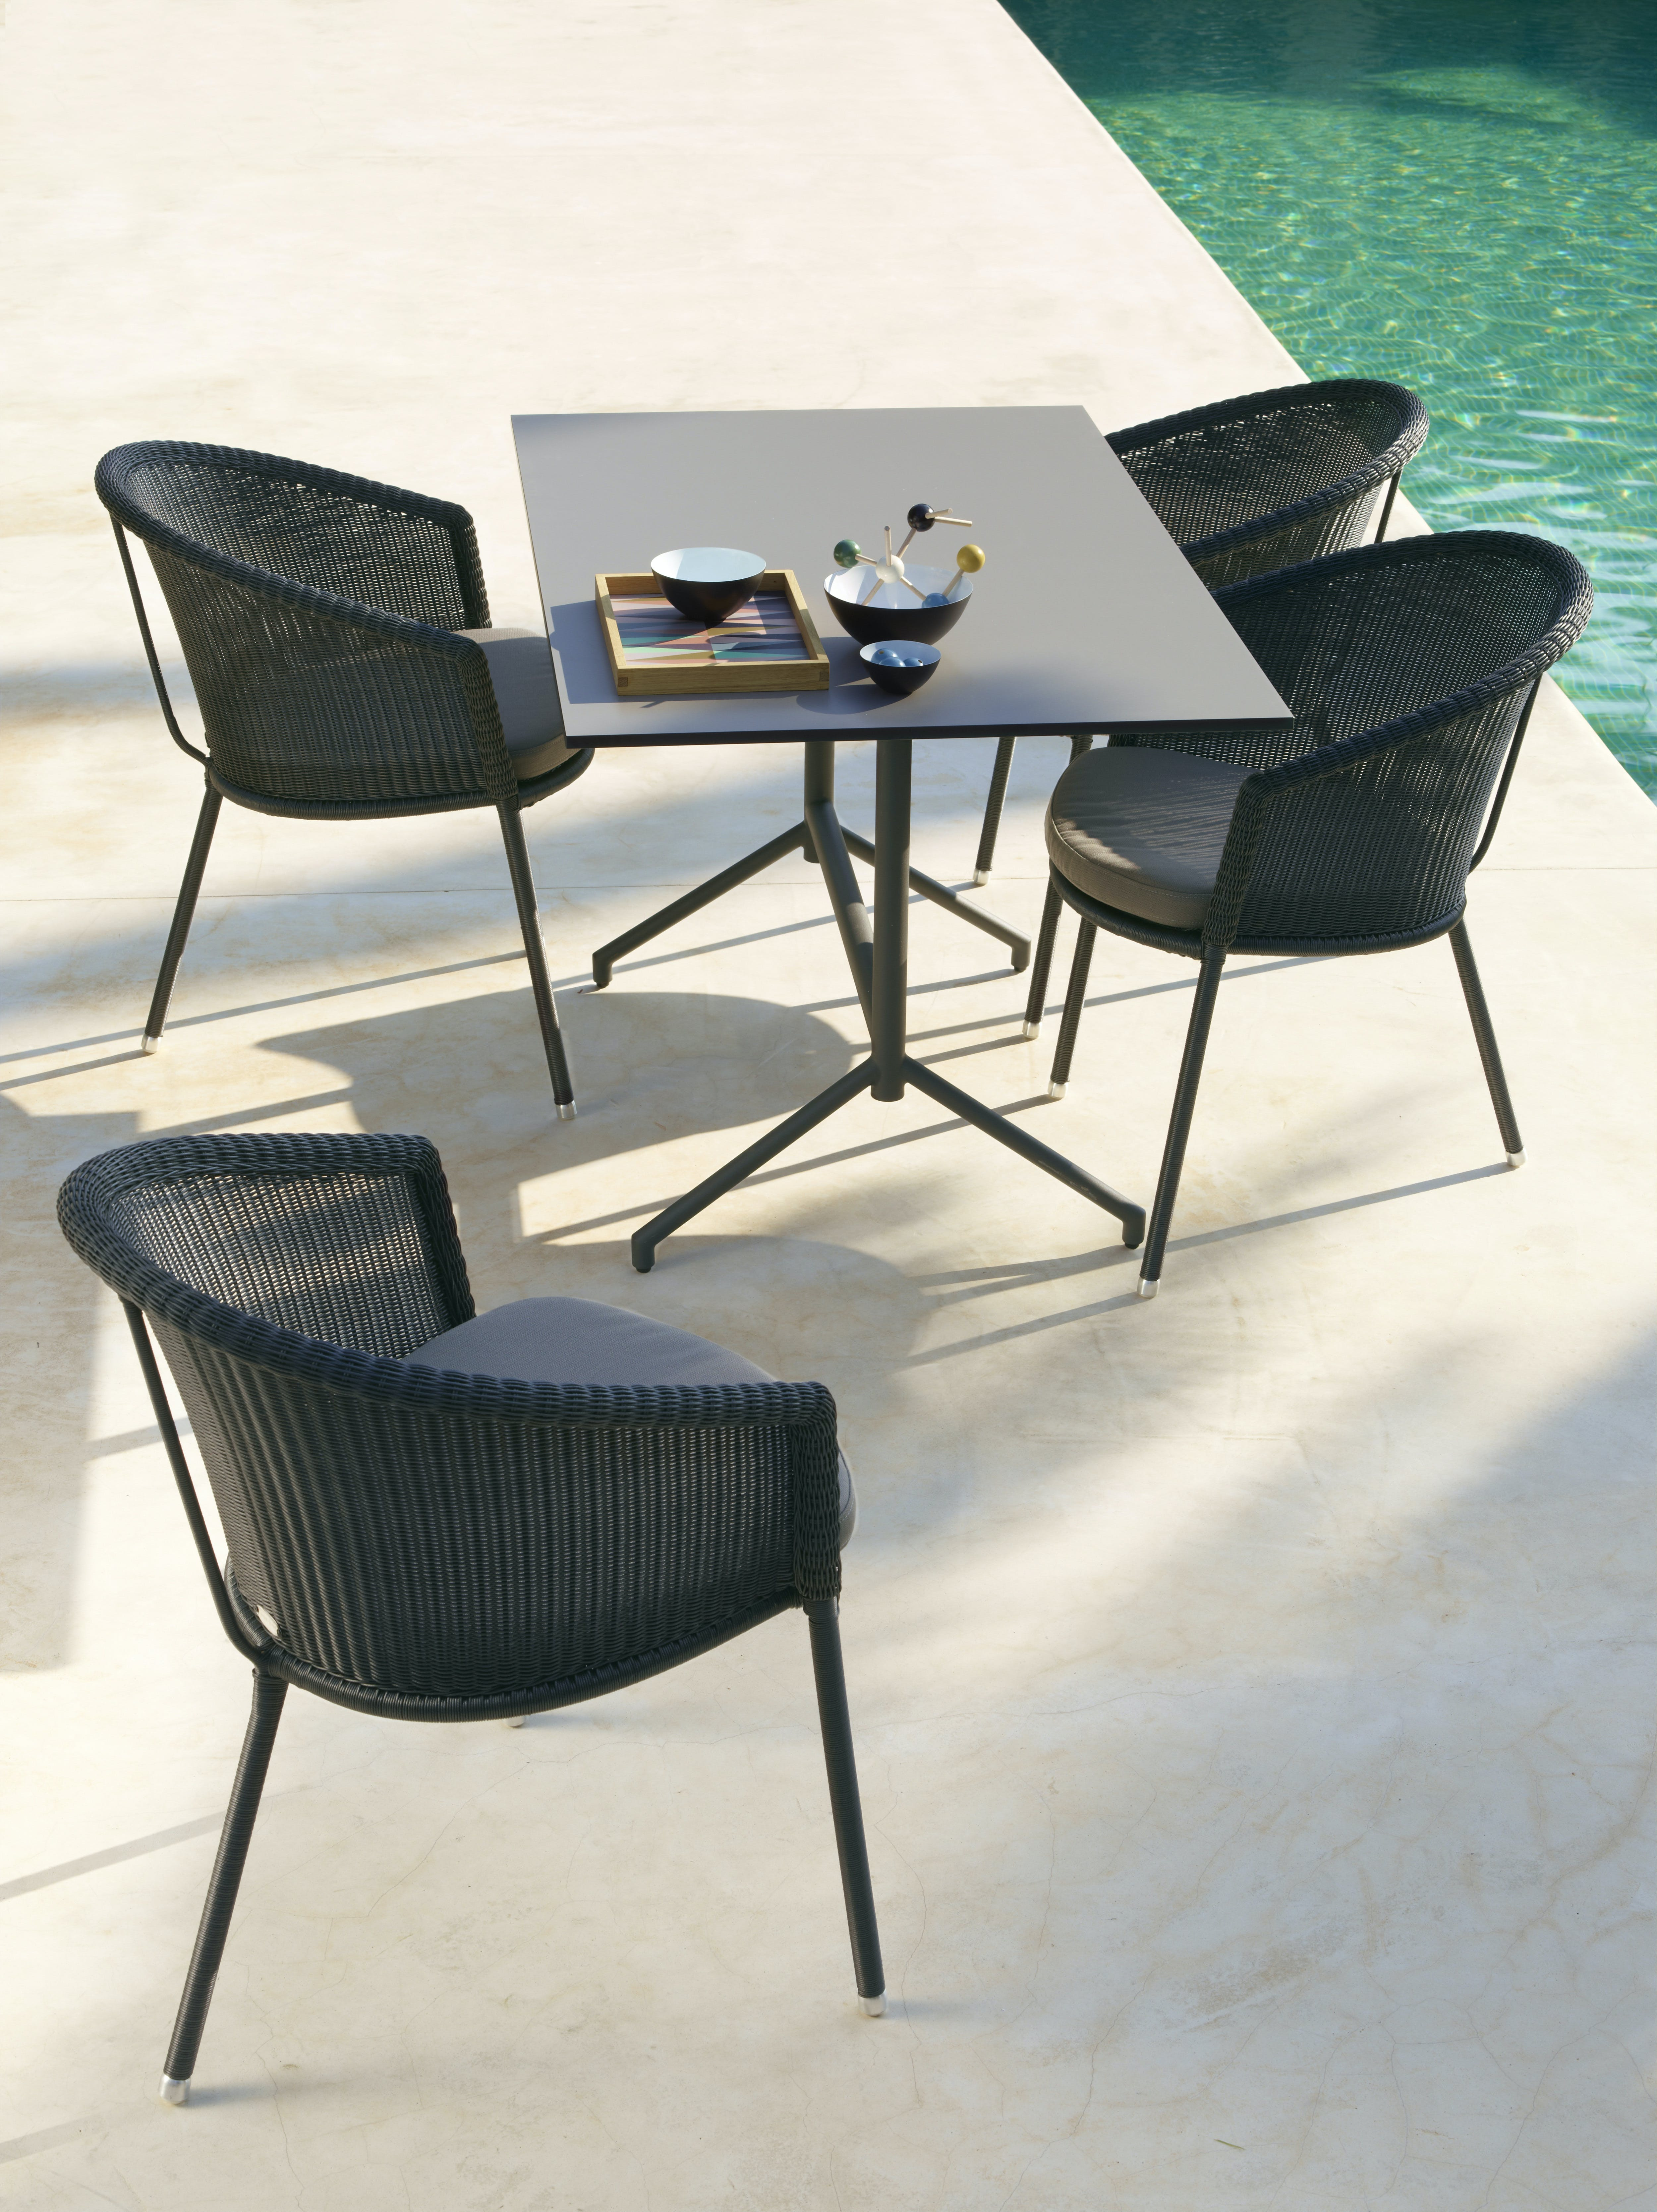 cane-line outdoor patio furniture haute living